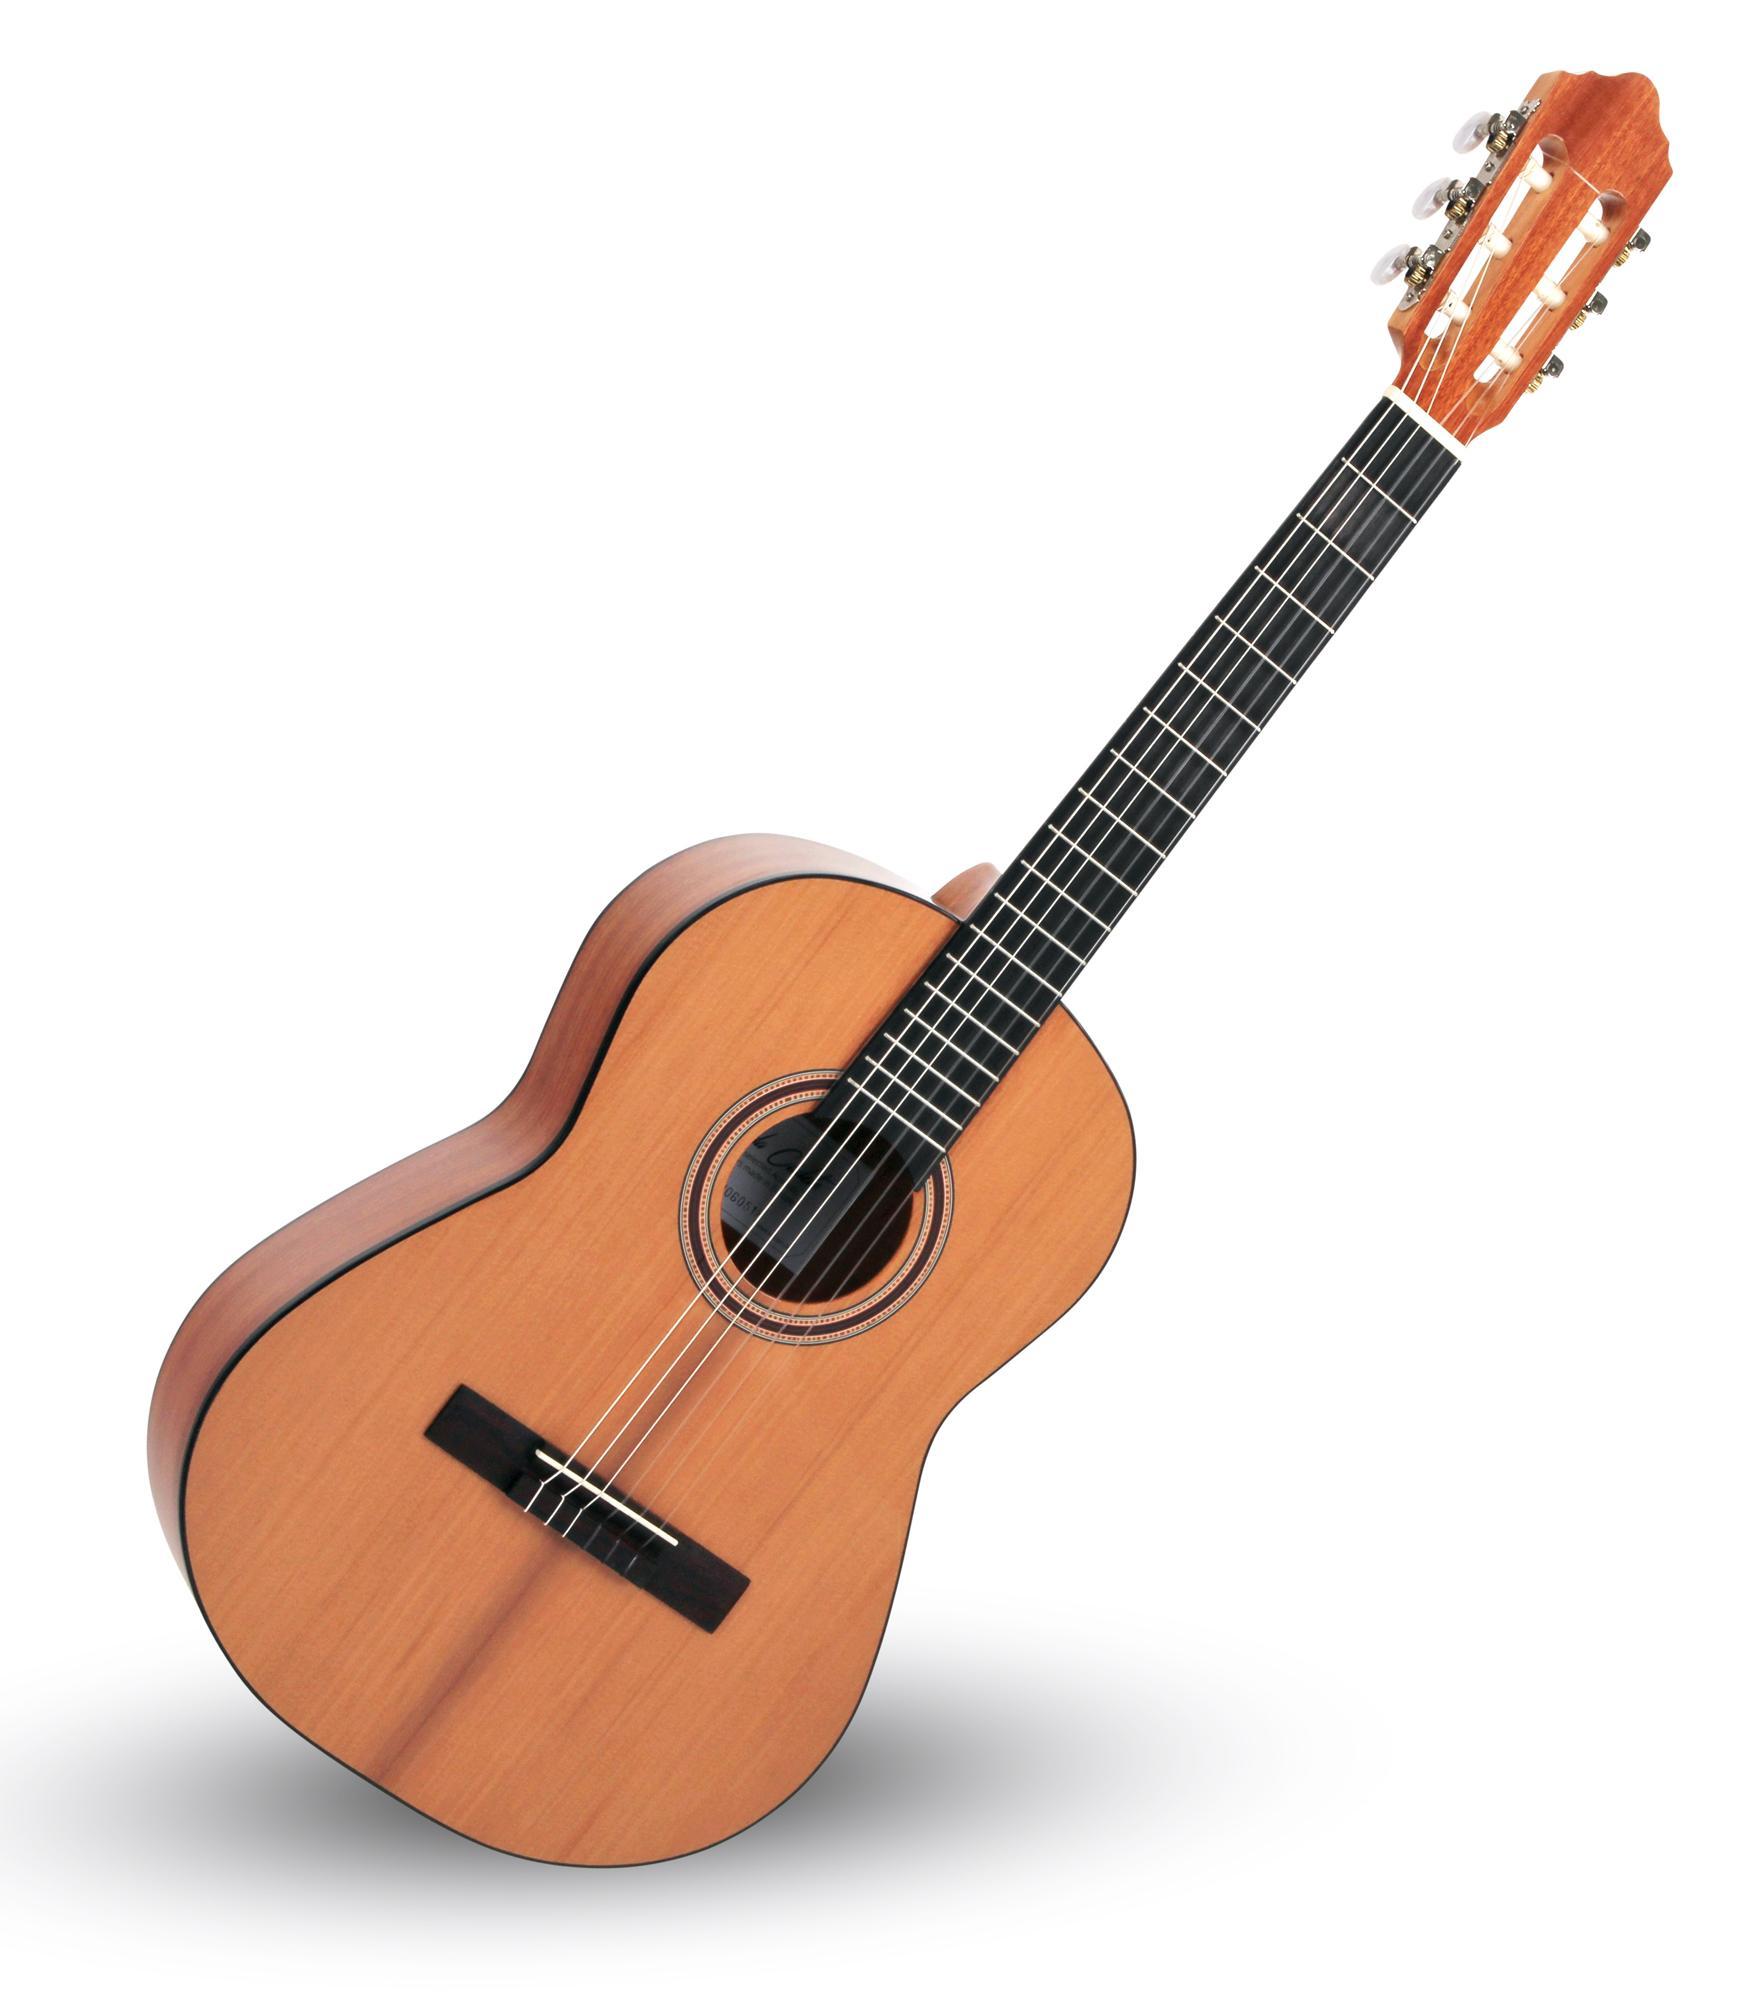 Calida Cadete Konzertgitarre 3|4 Zeder Hochglanz Made in Portugal